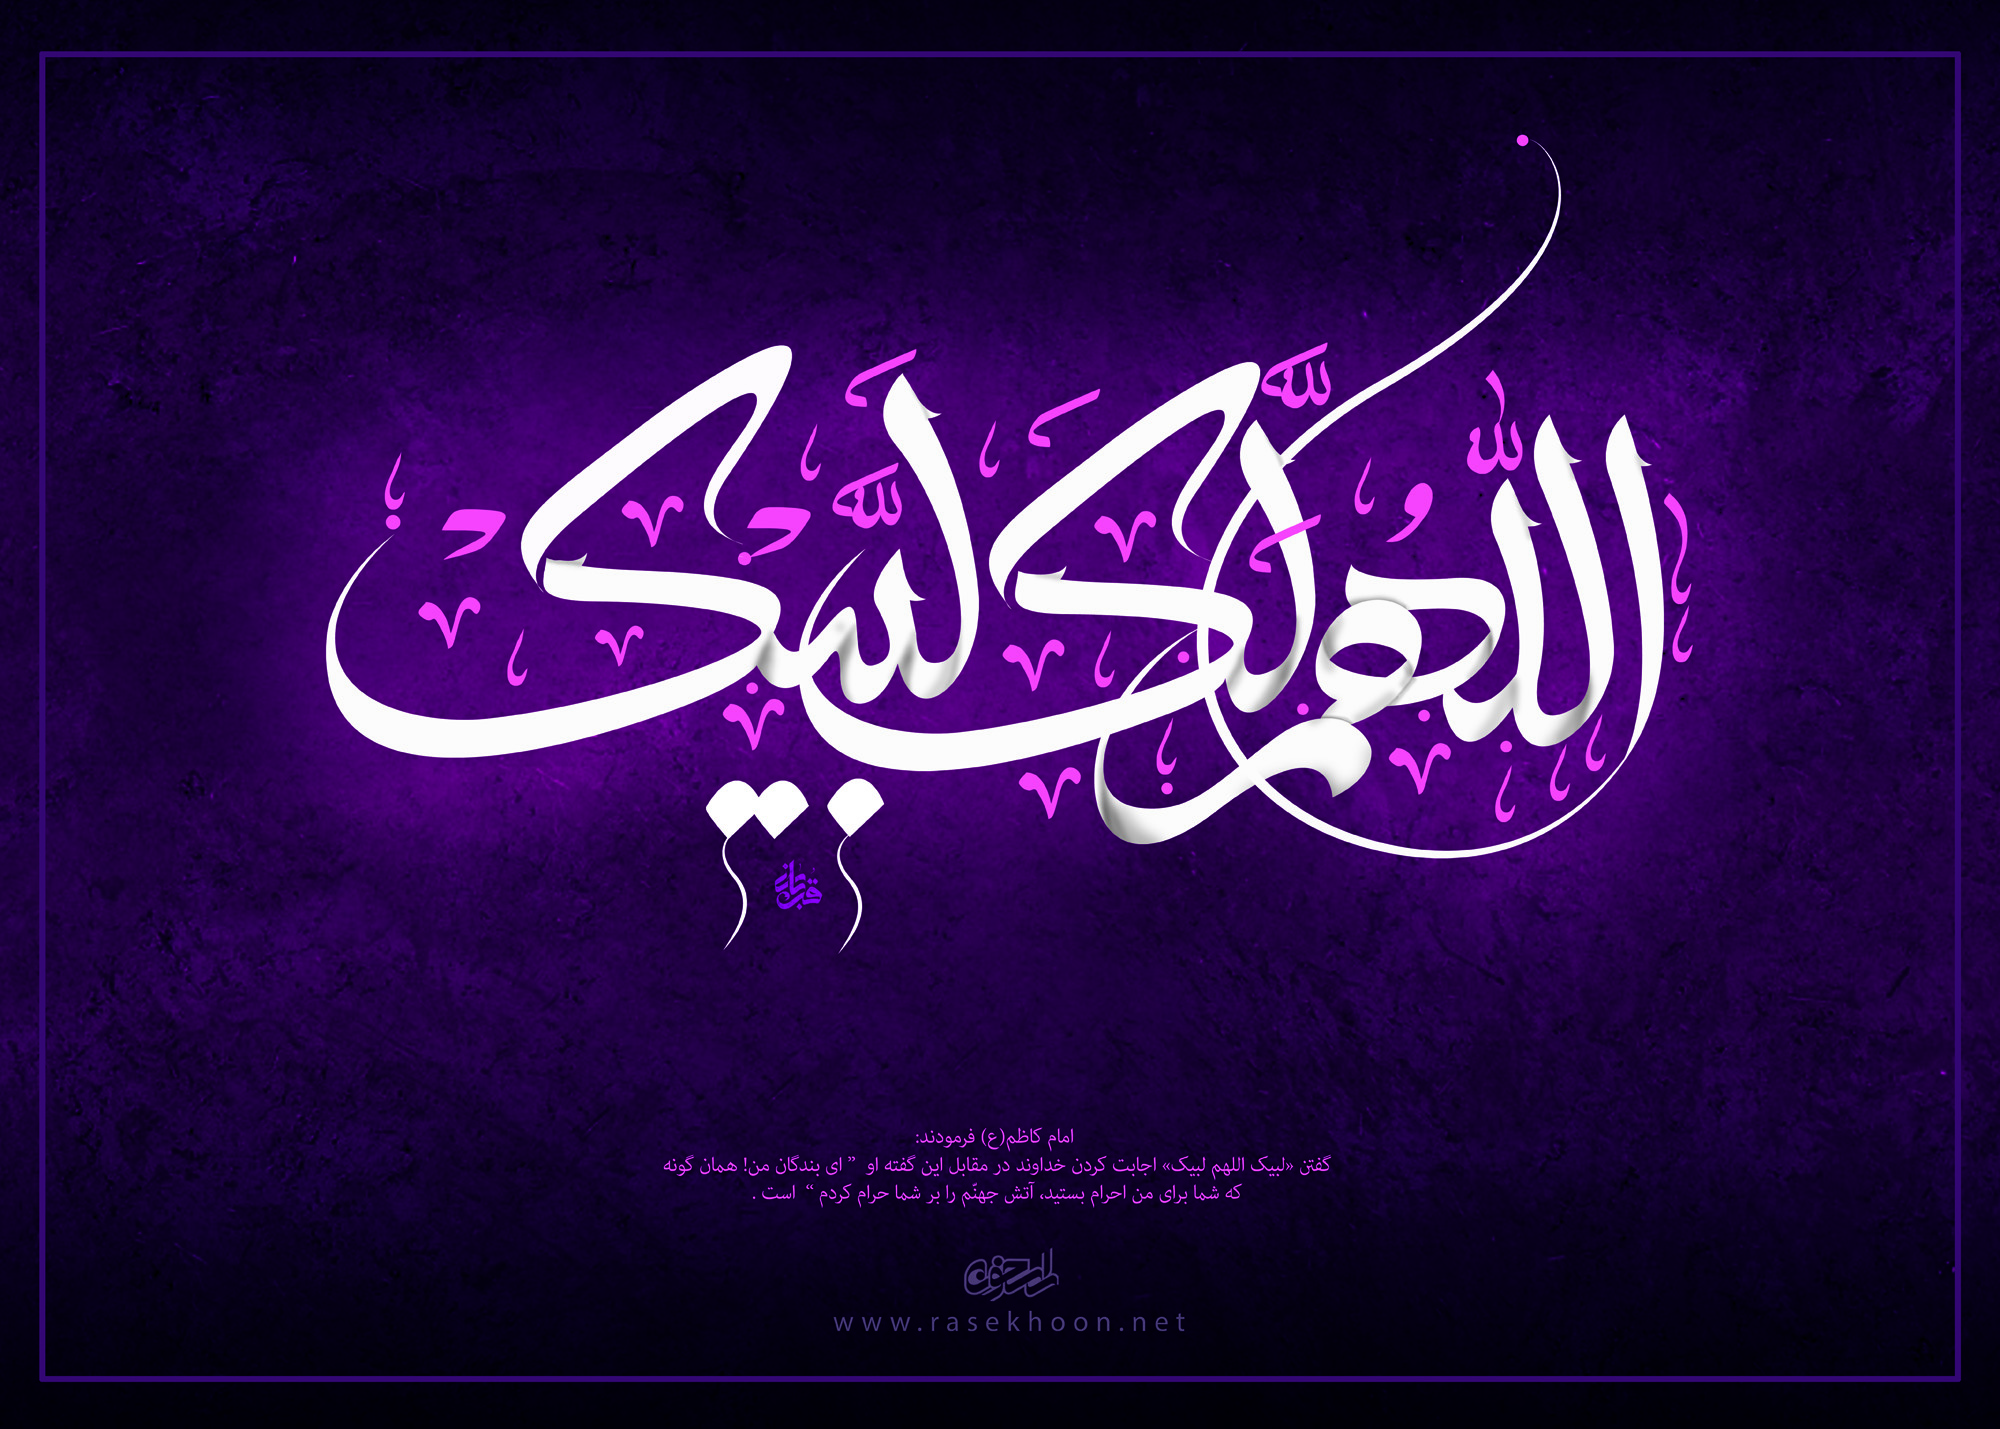 اللهم لک لبیک